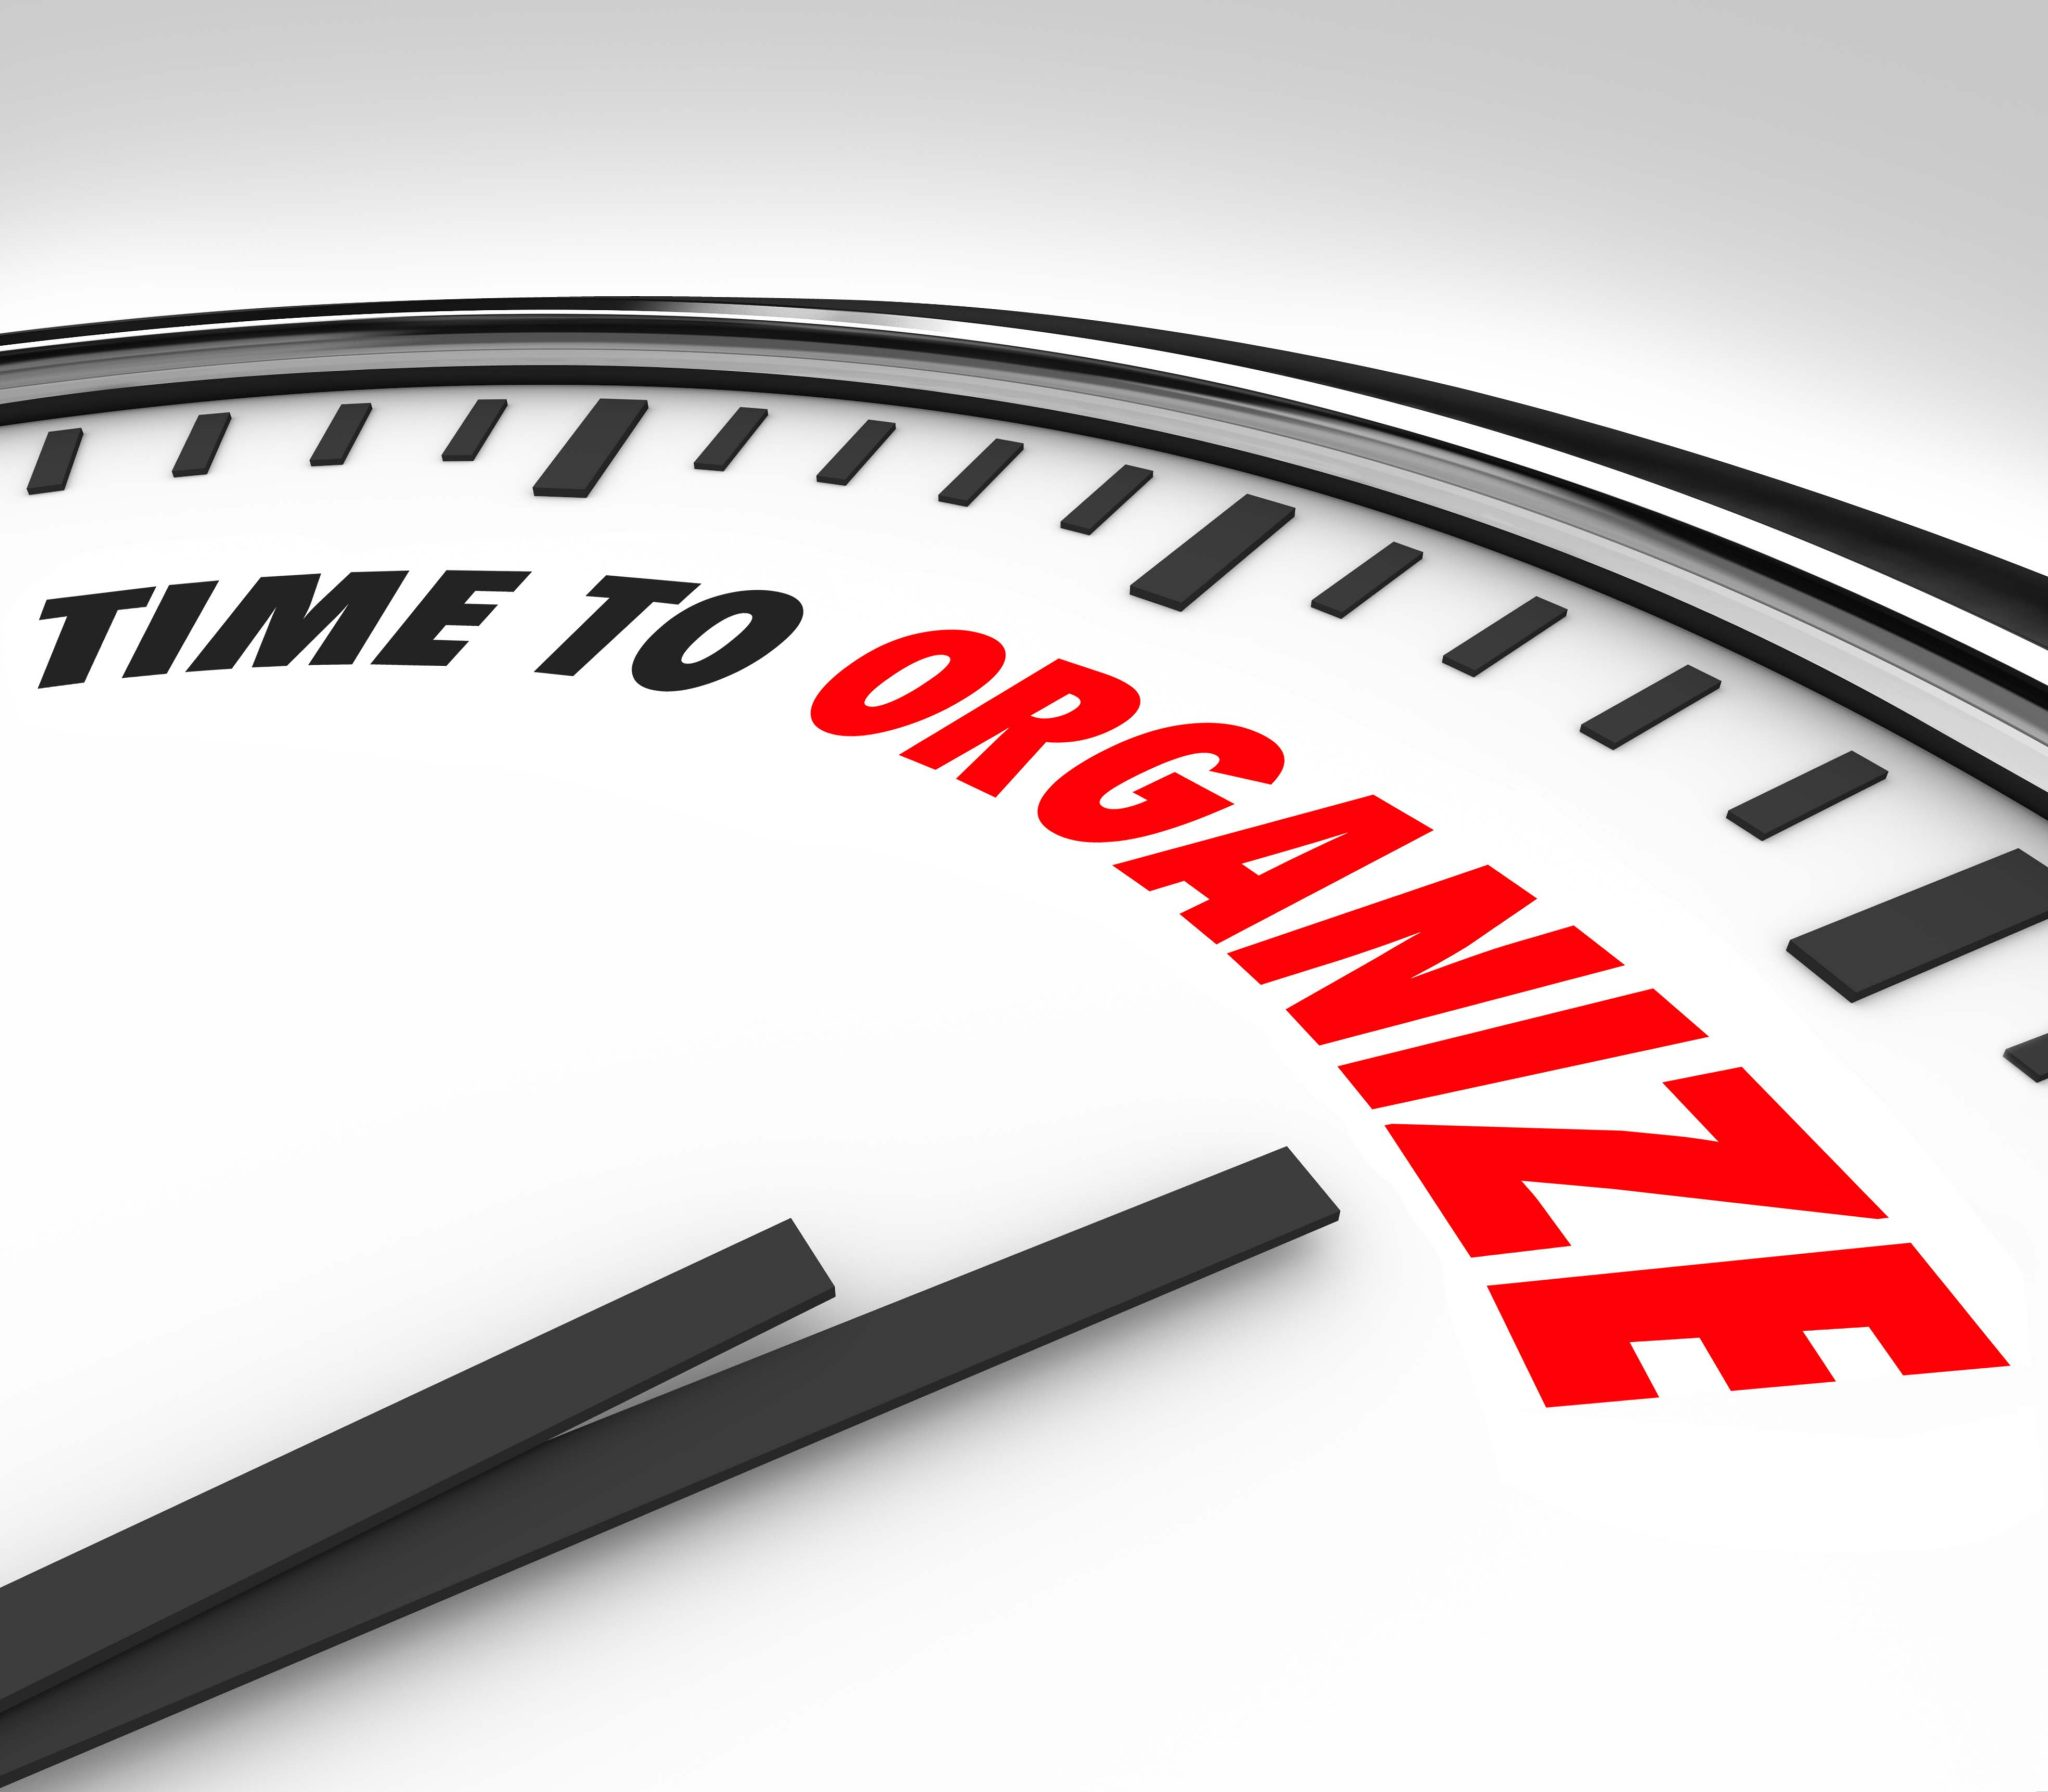 Organizing Blog Categories